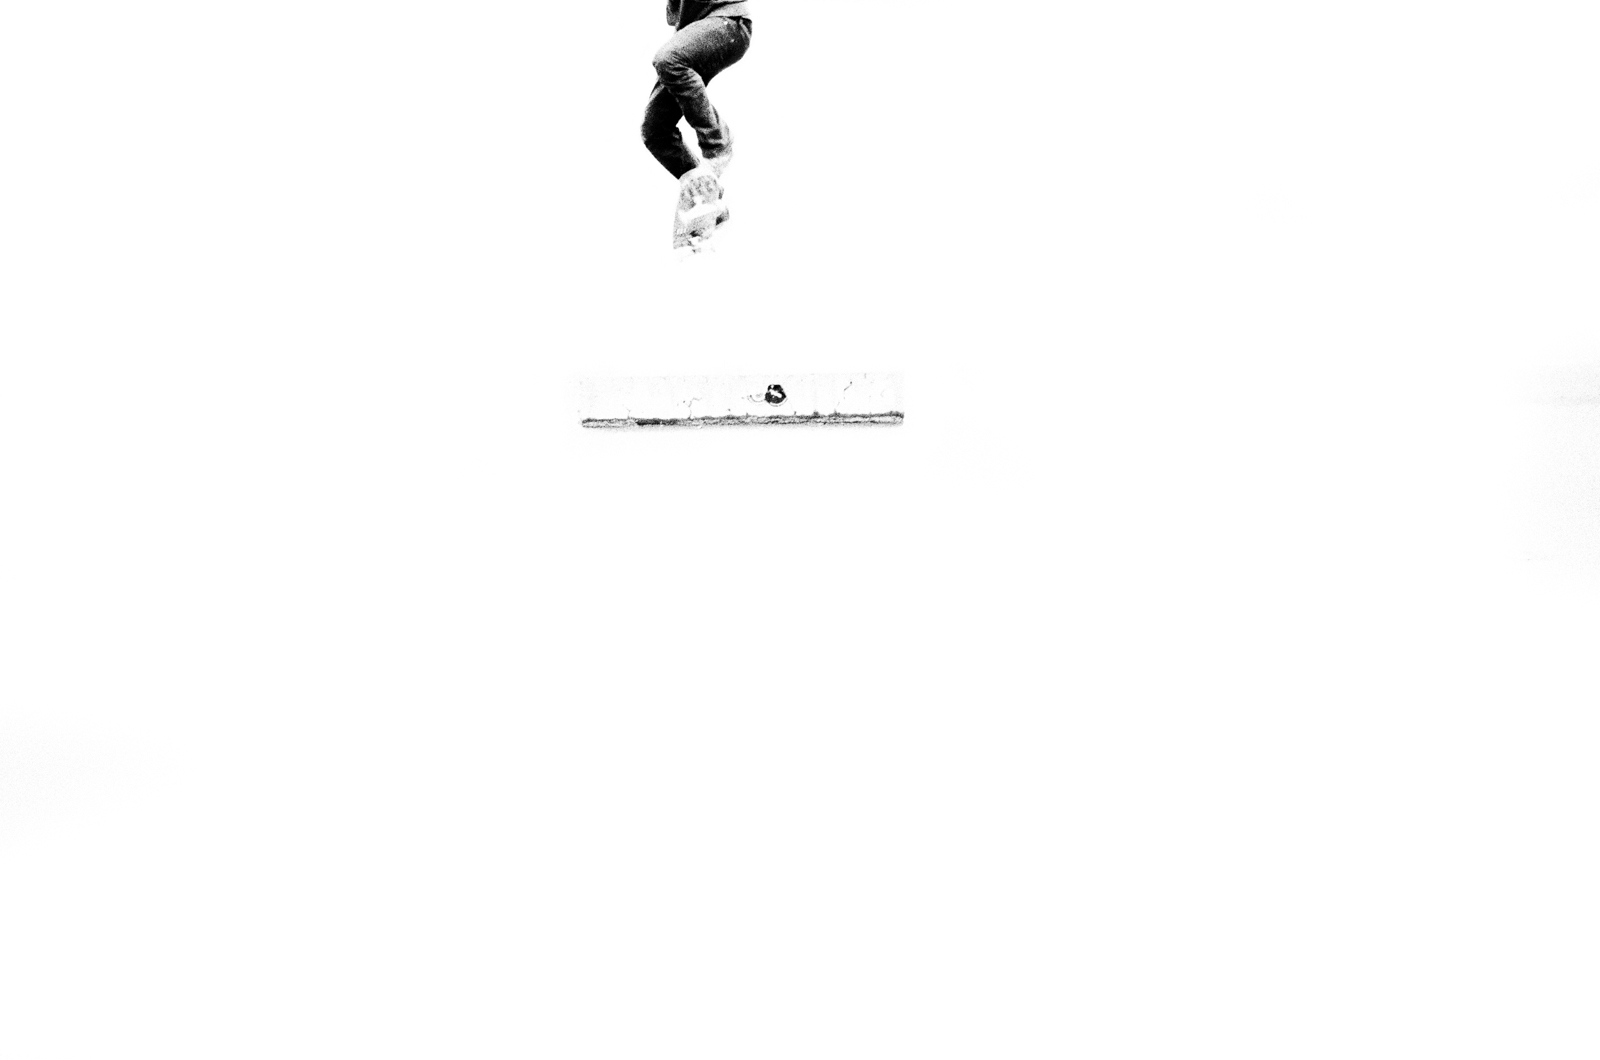 Skate white